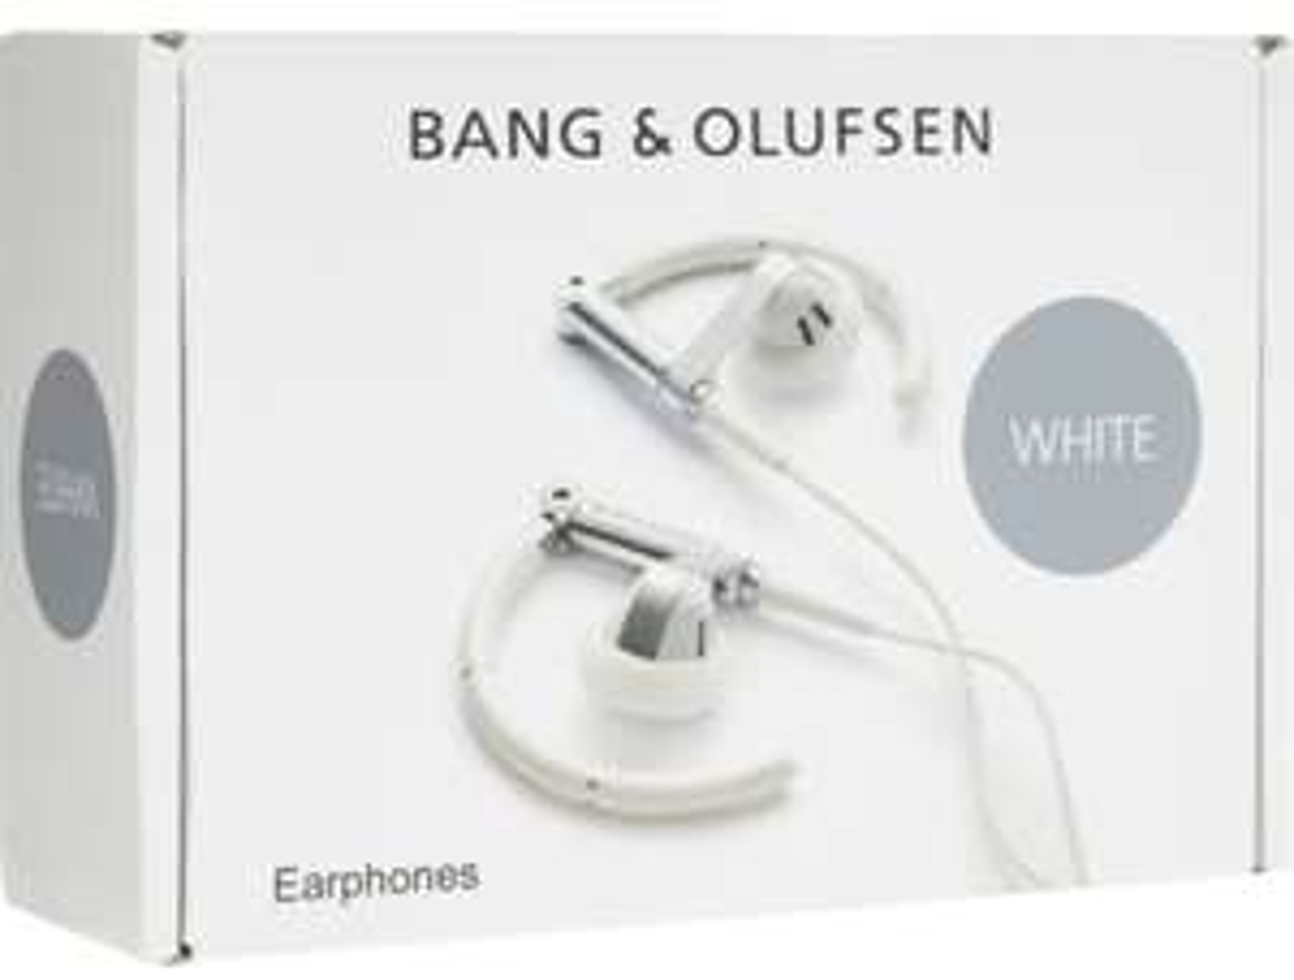 Bang & Olufsen Earphones - £59.99 @ TK Maxx (free C&C)